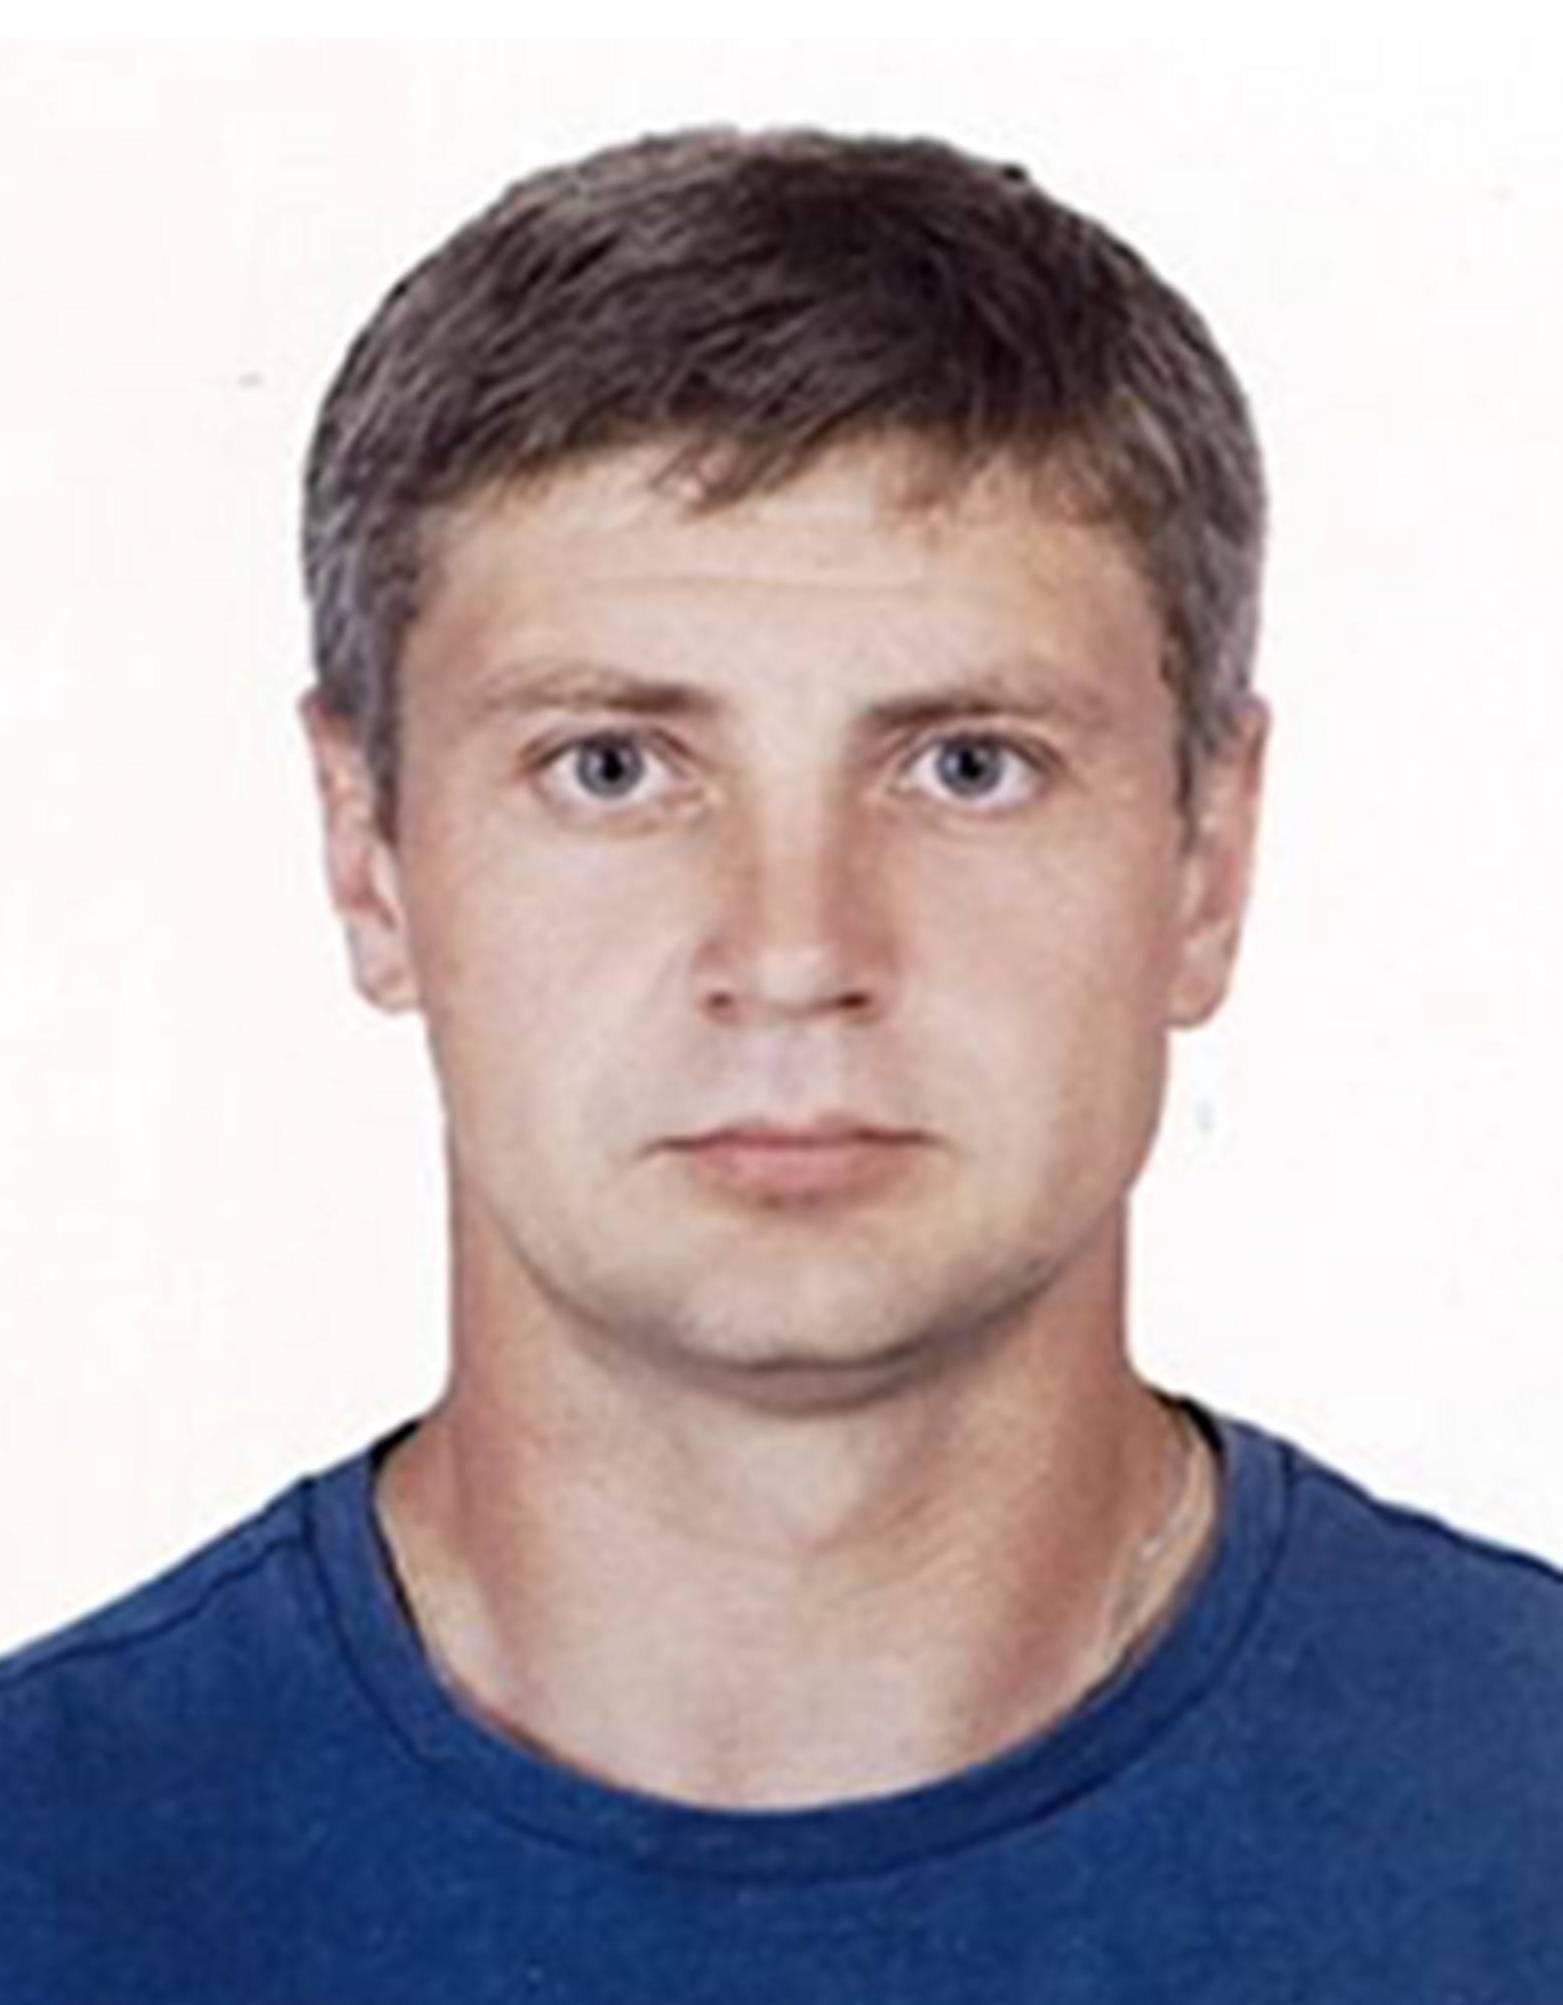 Федунов Михайло Володимирович